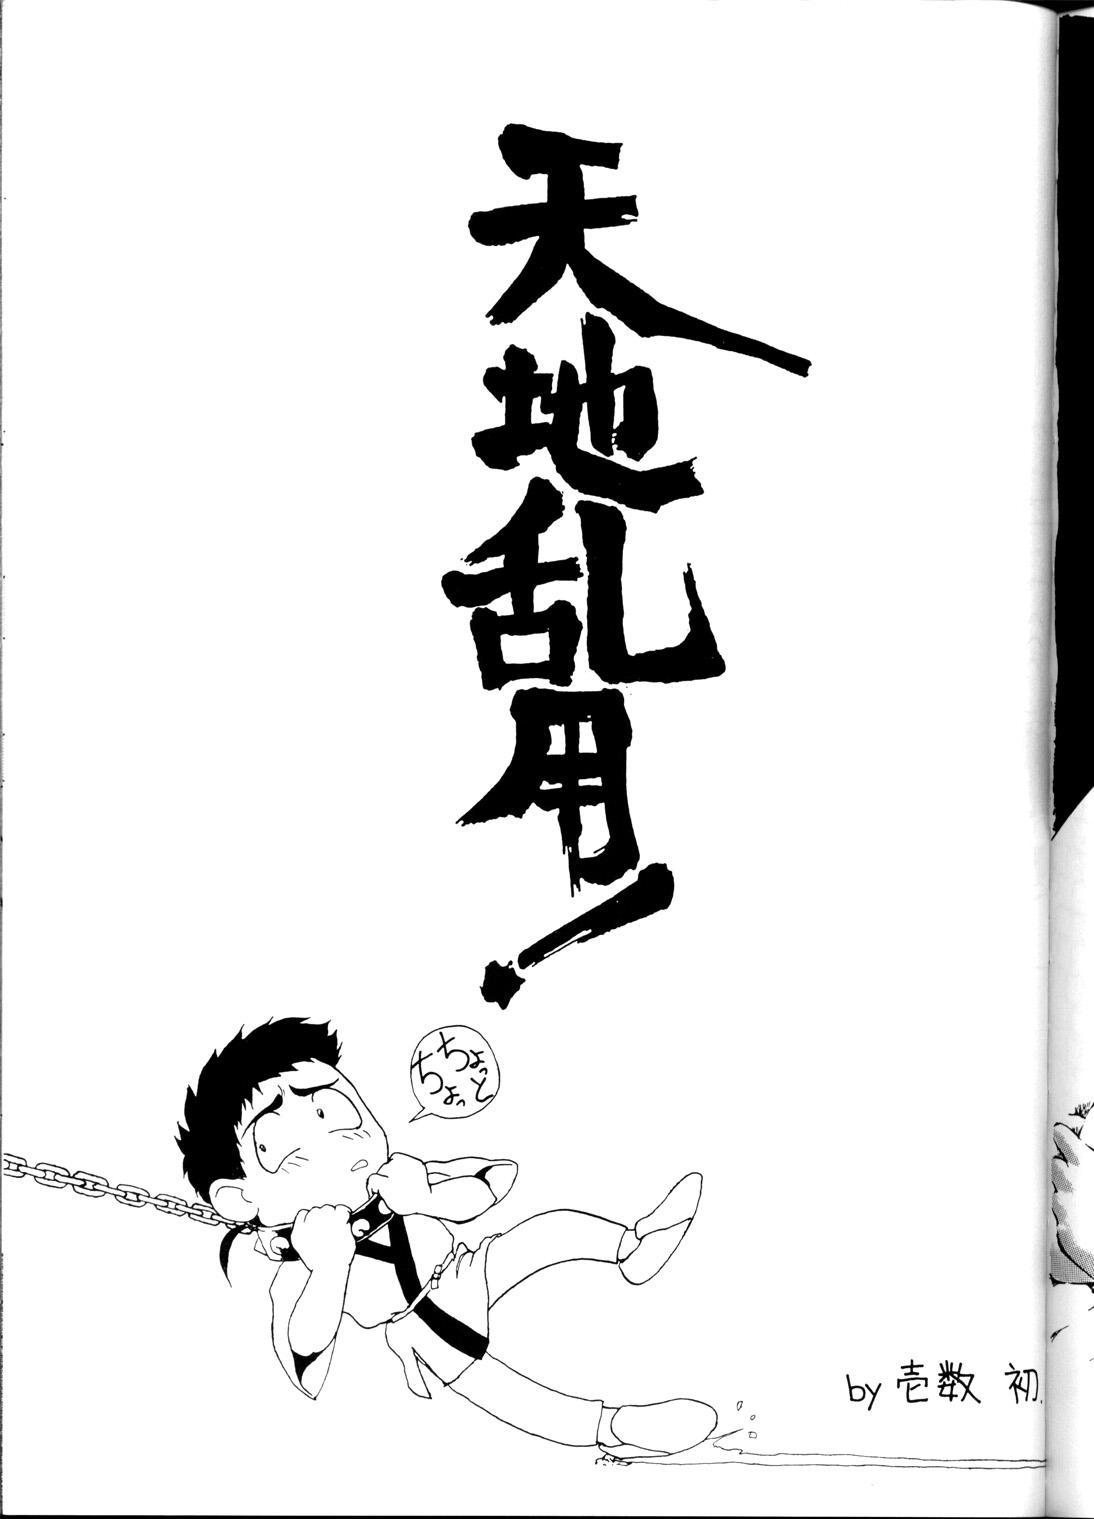 [B.B.C] Tenchi Muyou! Ryou-ou-ki Kaiteiben (Tenchi Muyou!) 67